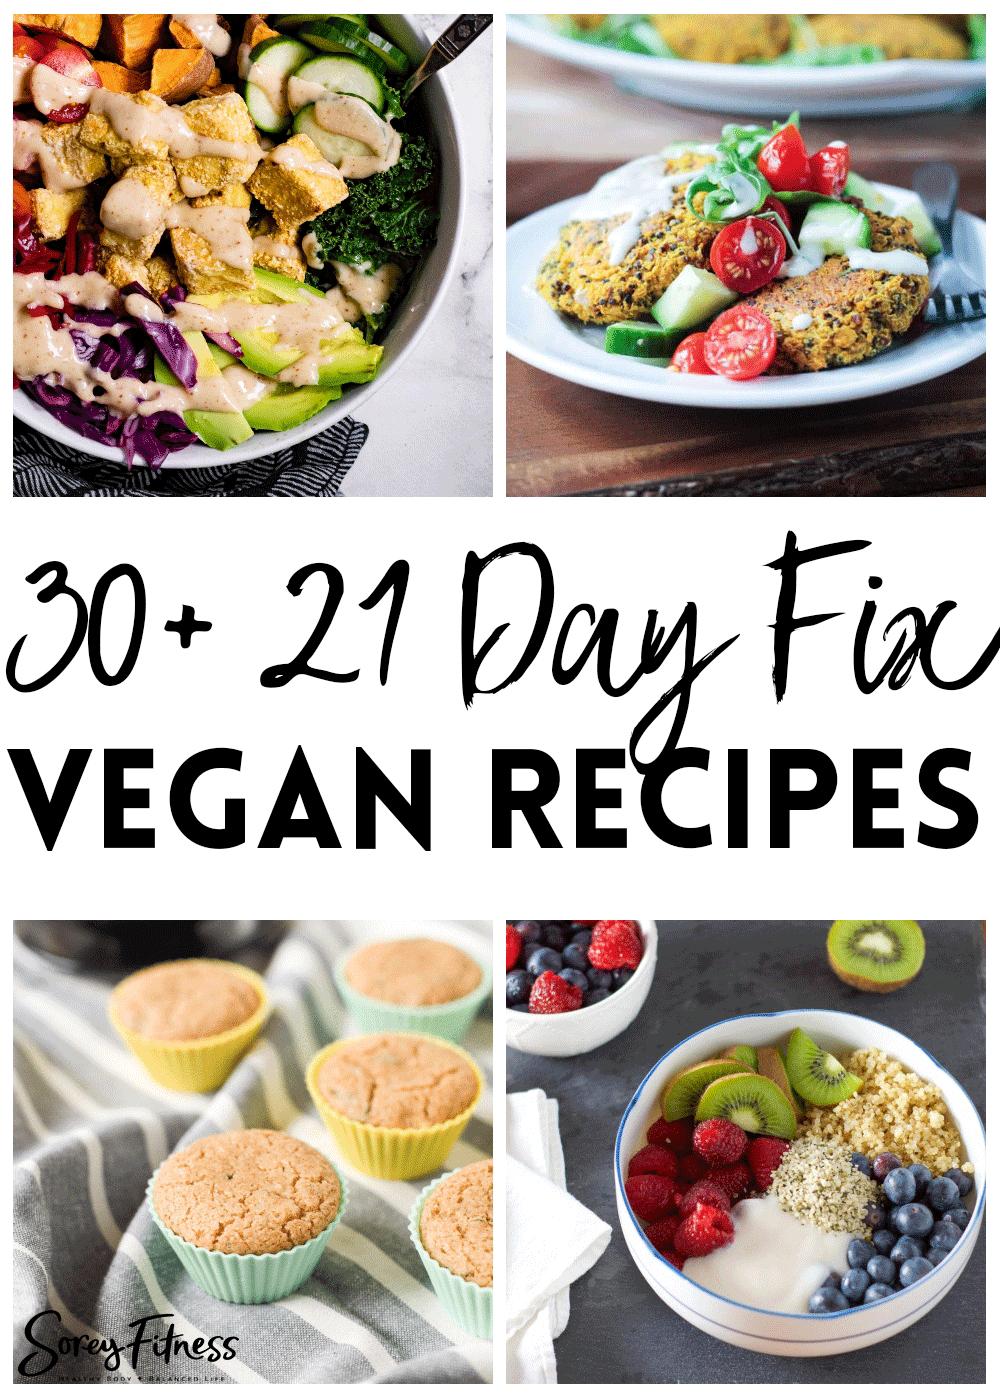 photo collage of vegan 21 day fix recipes